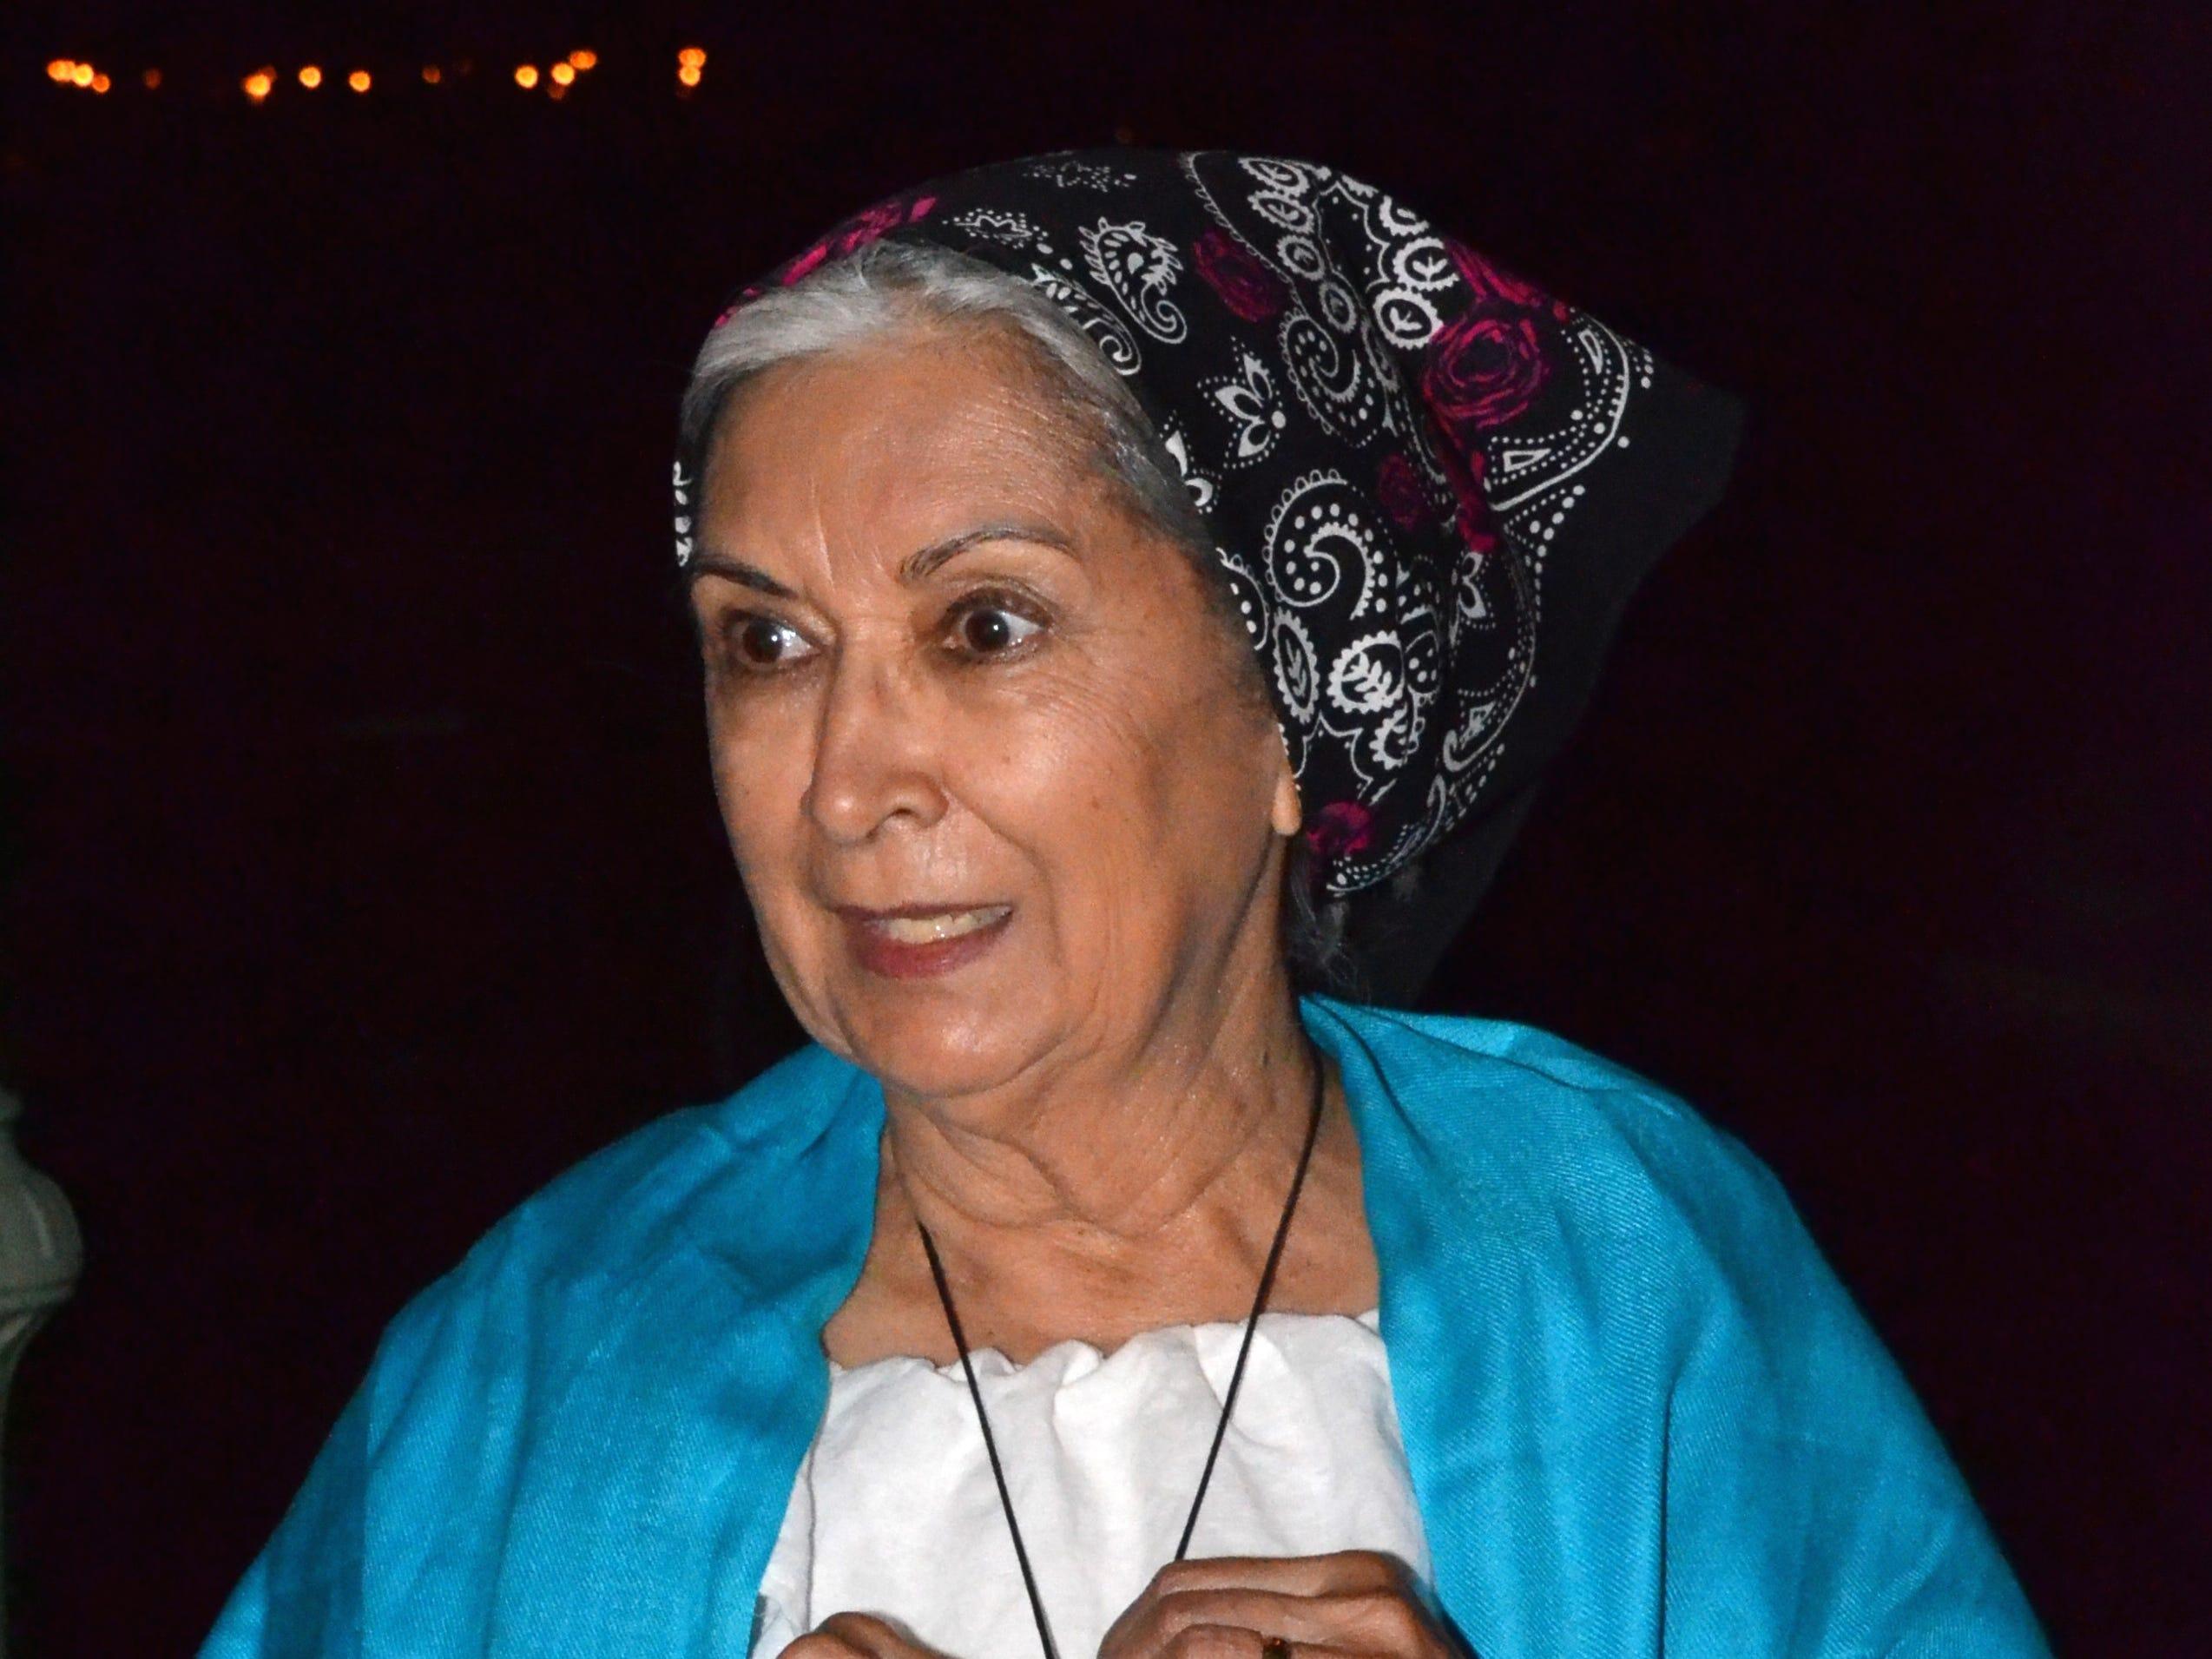 Re-enactor Angie Morgan portrays Luisa Robledo, daughter of Pedro Robledo.